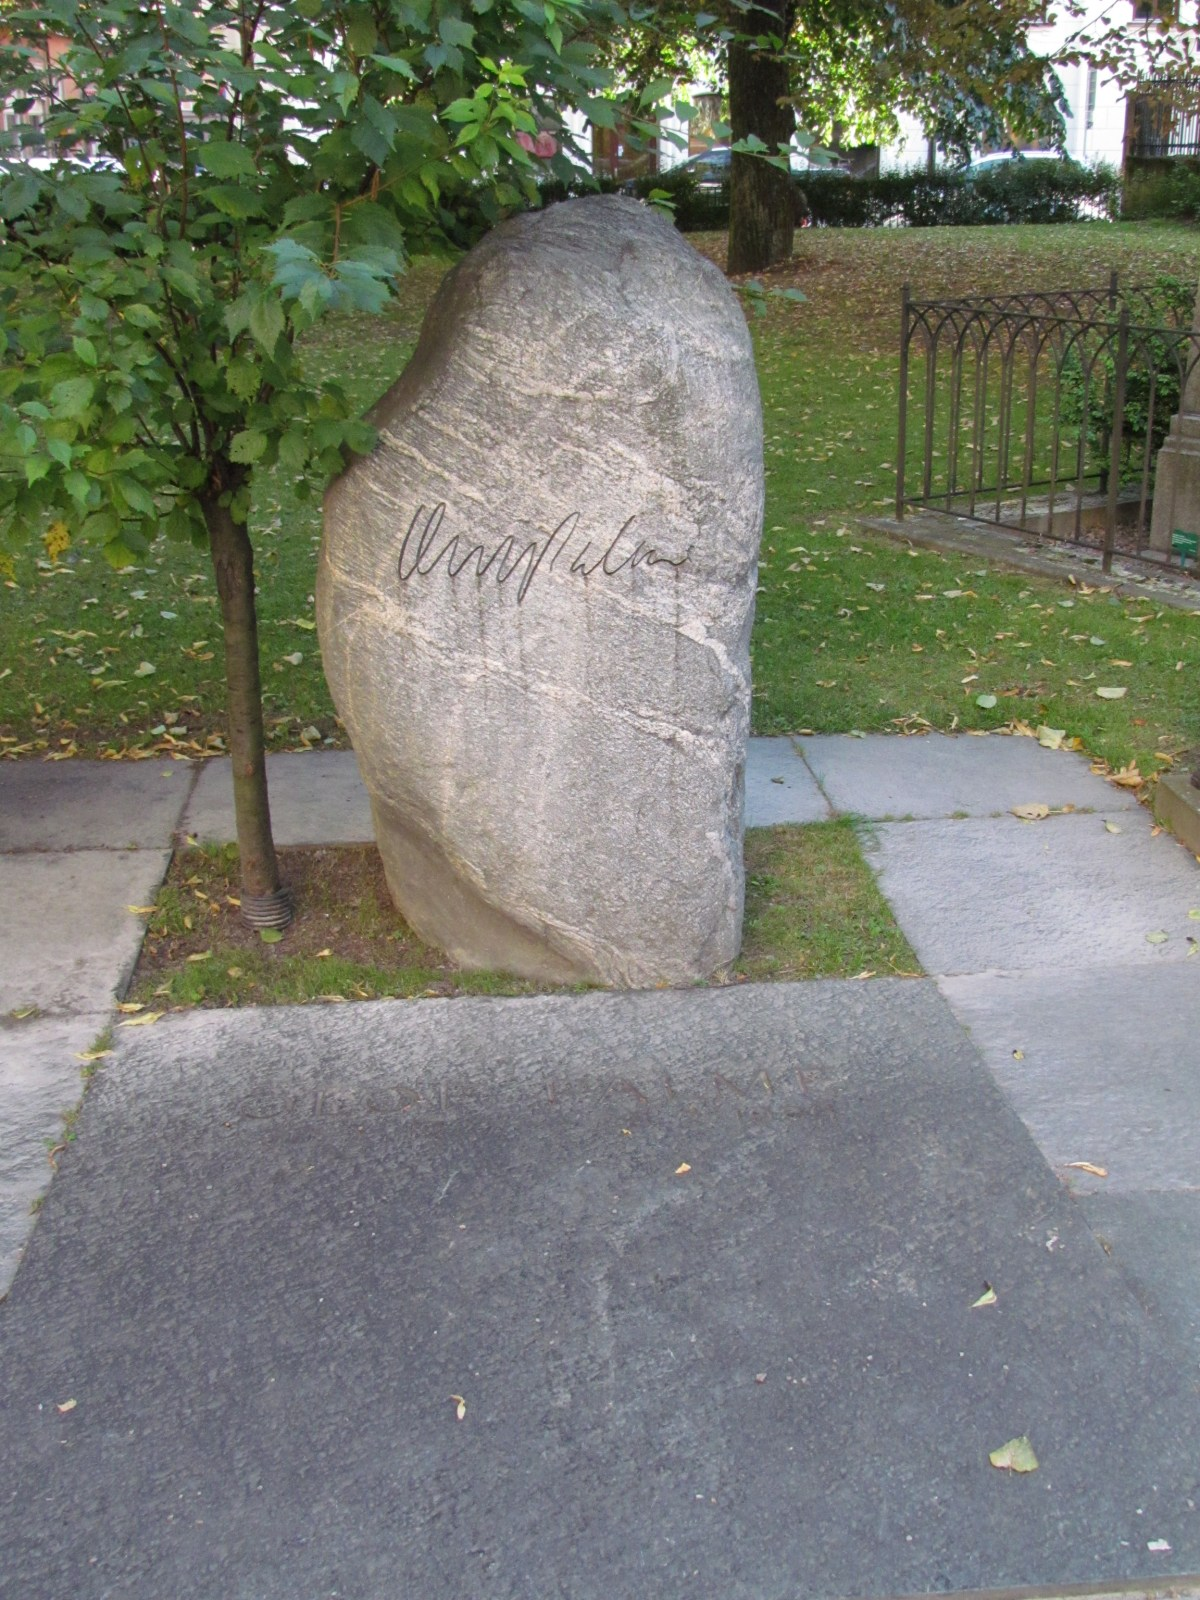 Olof Palme's grave marker